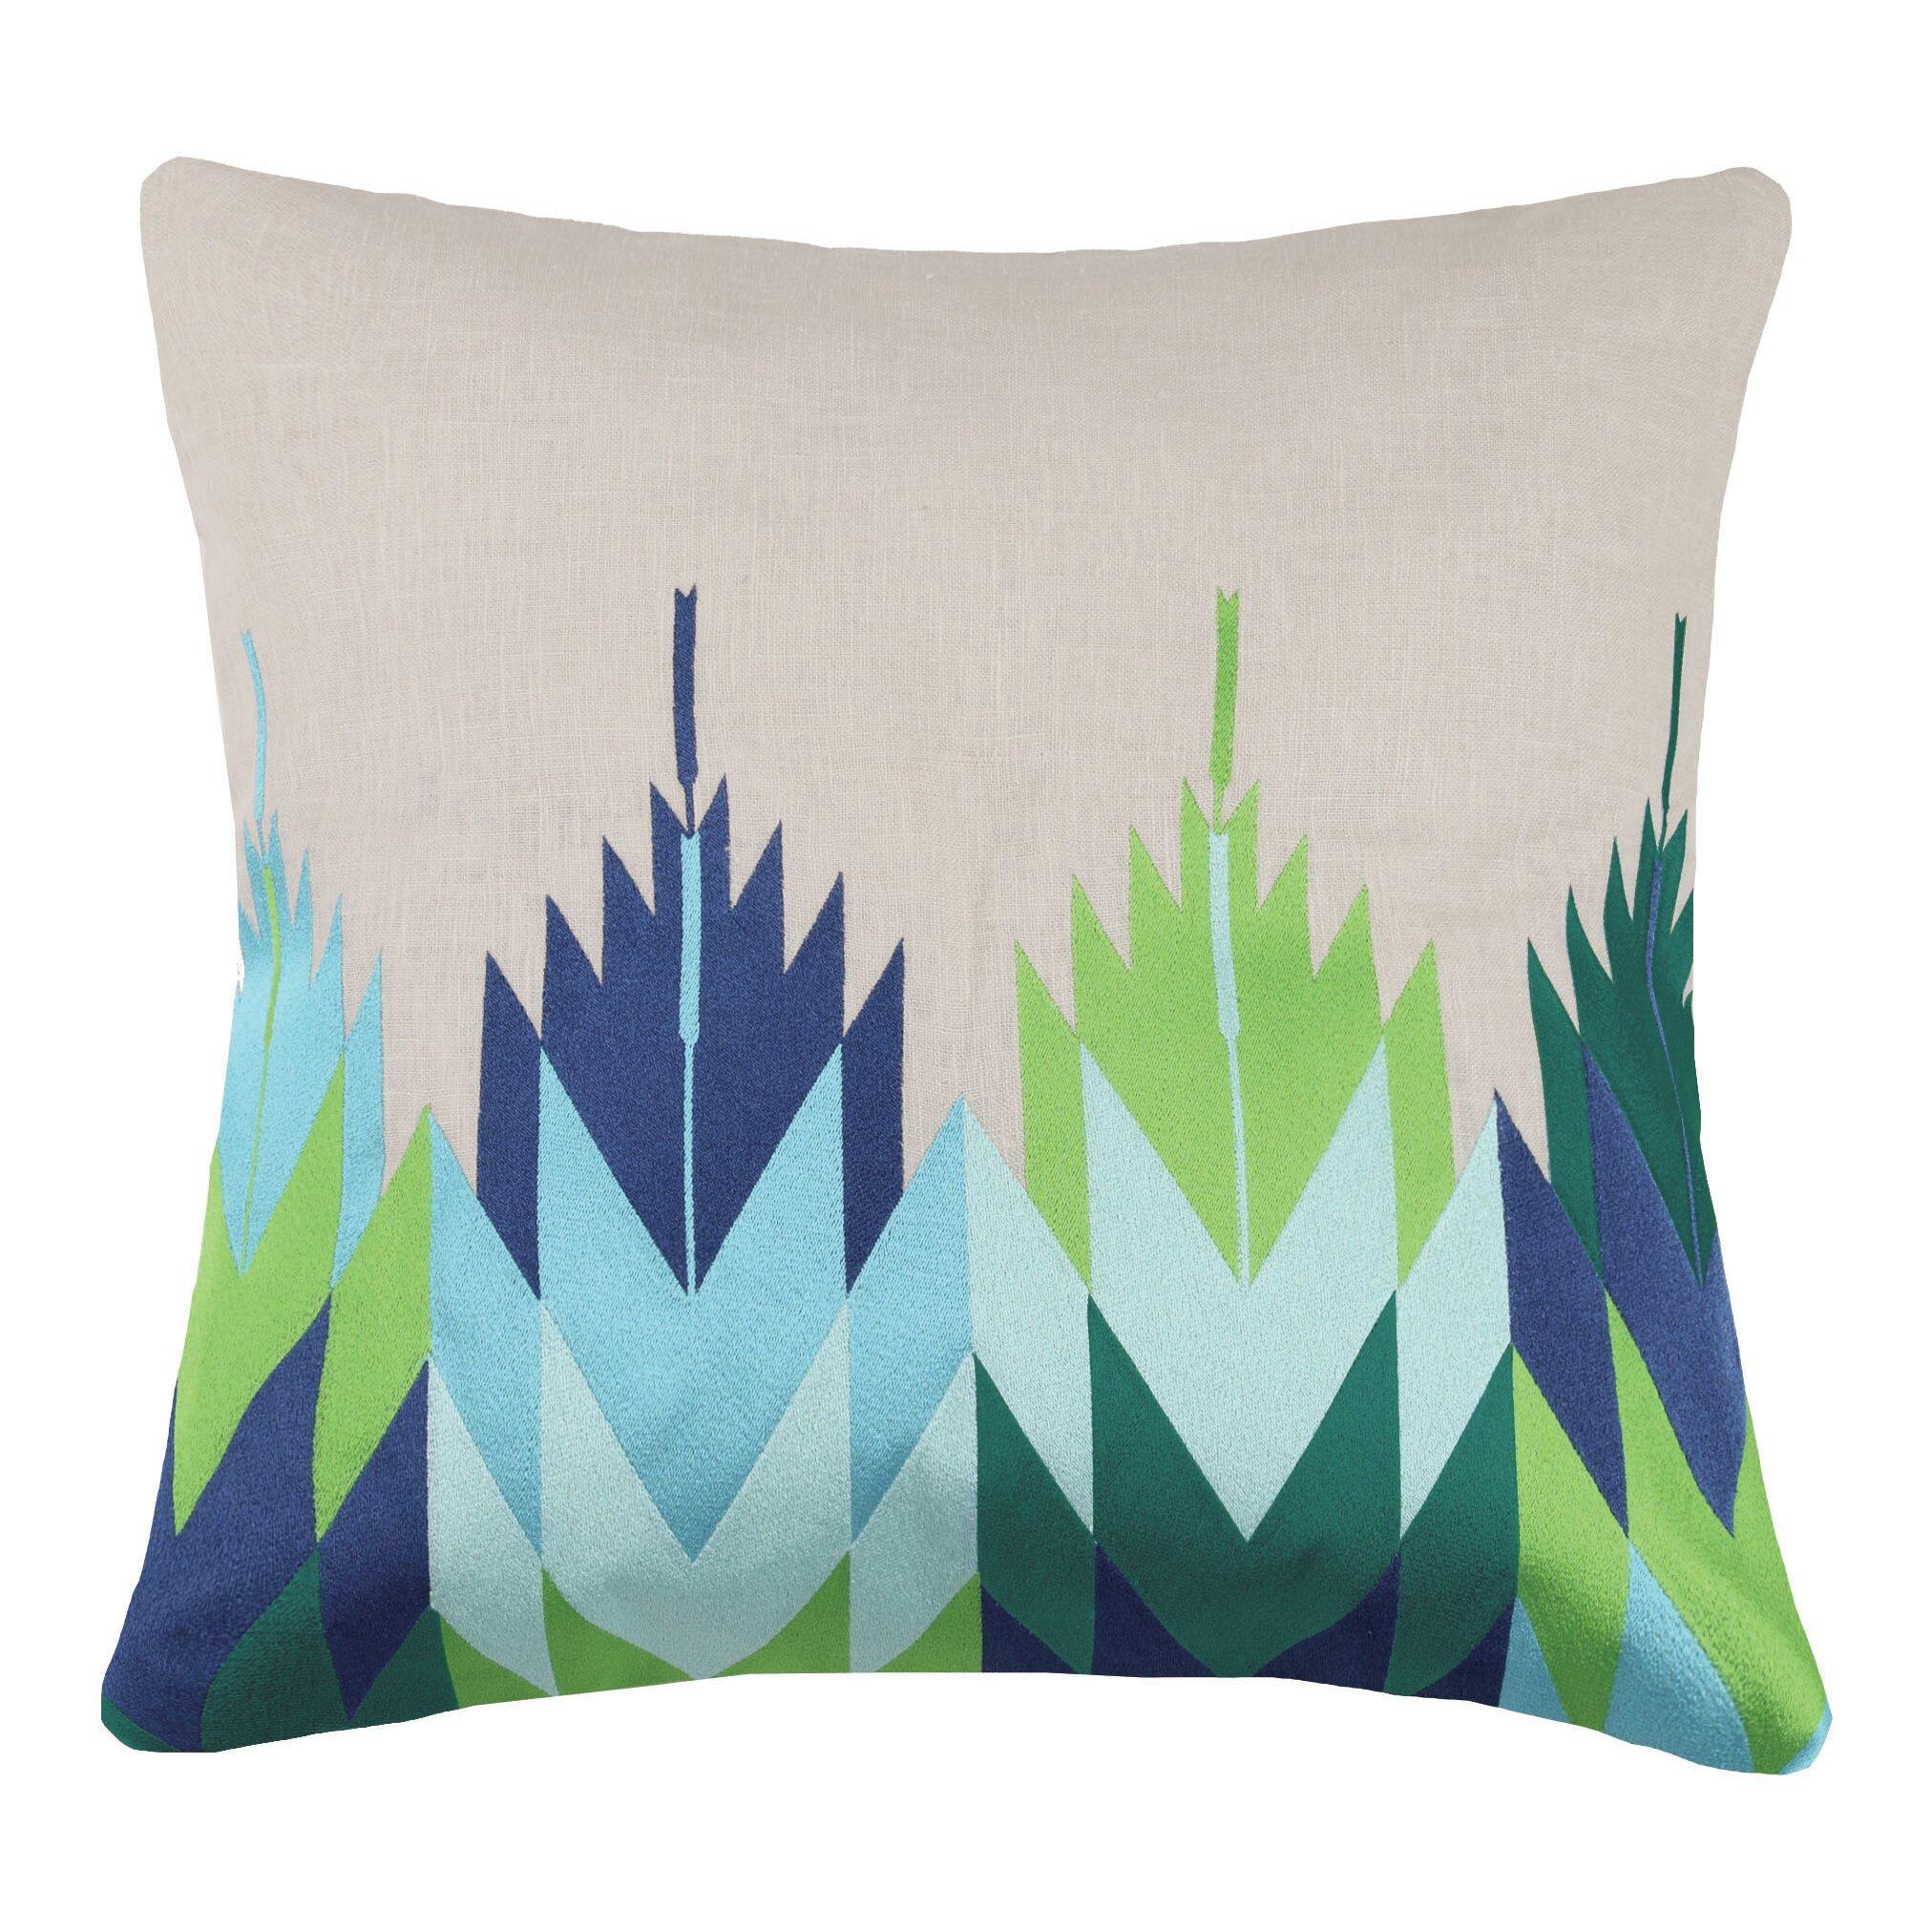 Decorative Pillows Trina Turk : Trina Turk Cypress Embroidered Linen Throw Pillow Wayfair